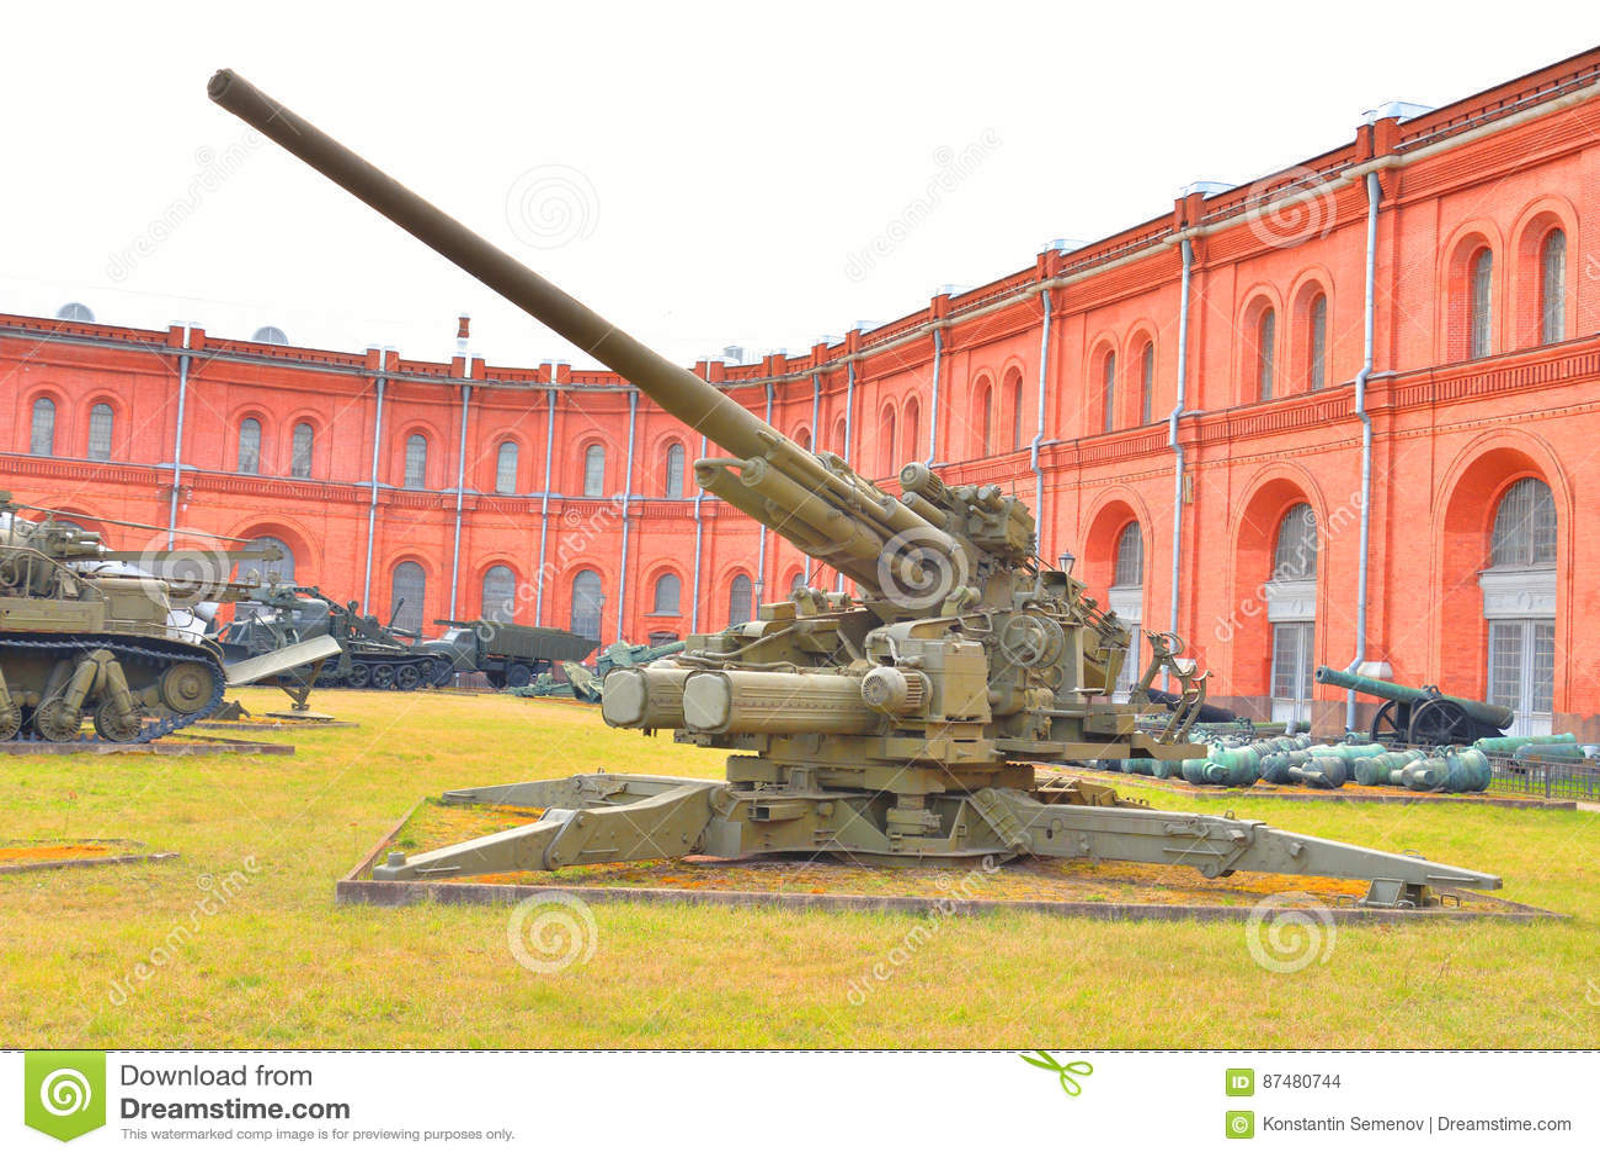 130mm anti-aircraft gun KS-30 in Military Artillery Museum.